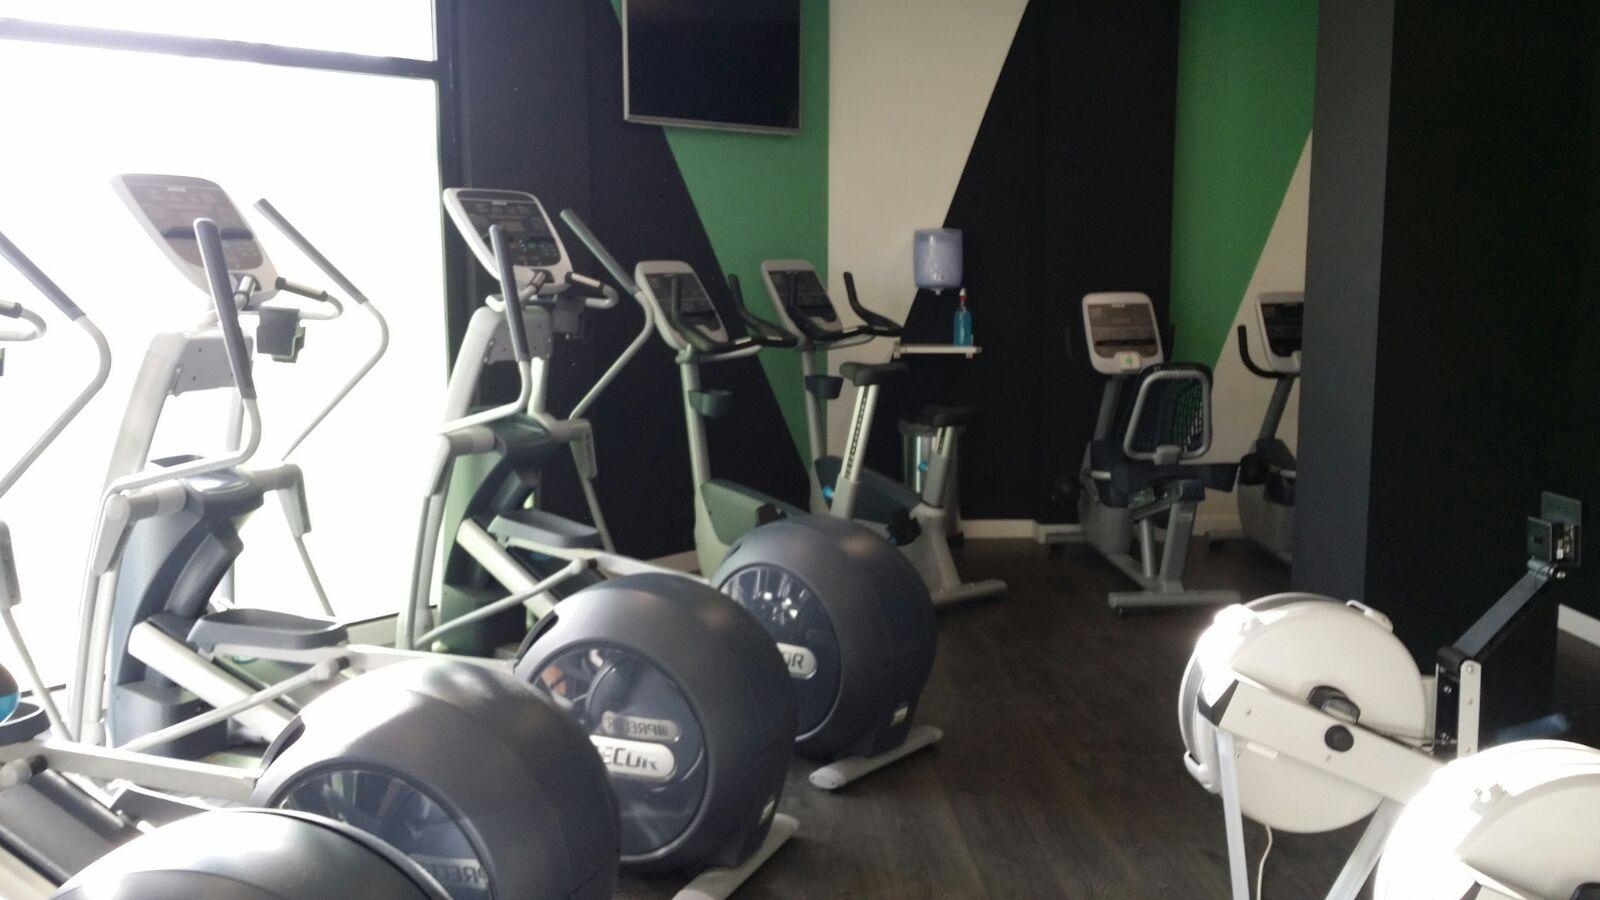 Foto 4 Oferta Gimnasio WUW Fitness El Prat El Prat de Llobregat - GymForLess